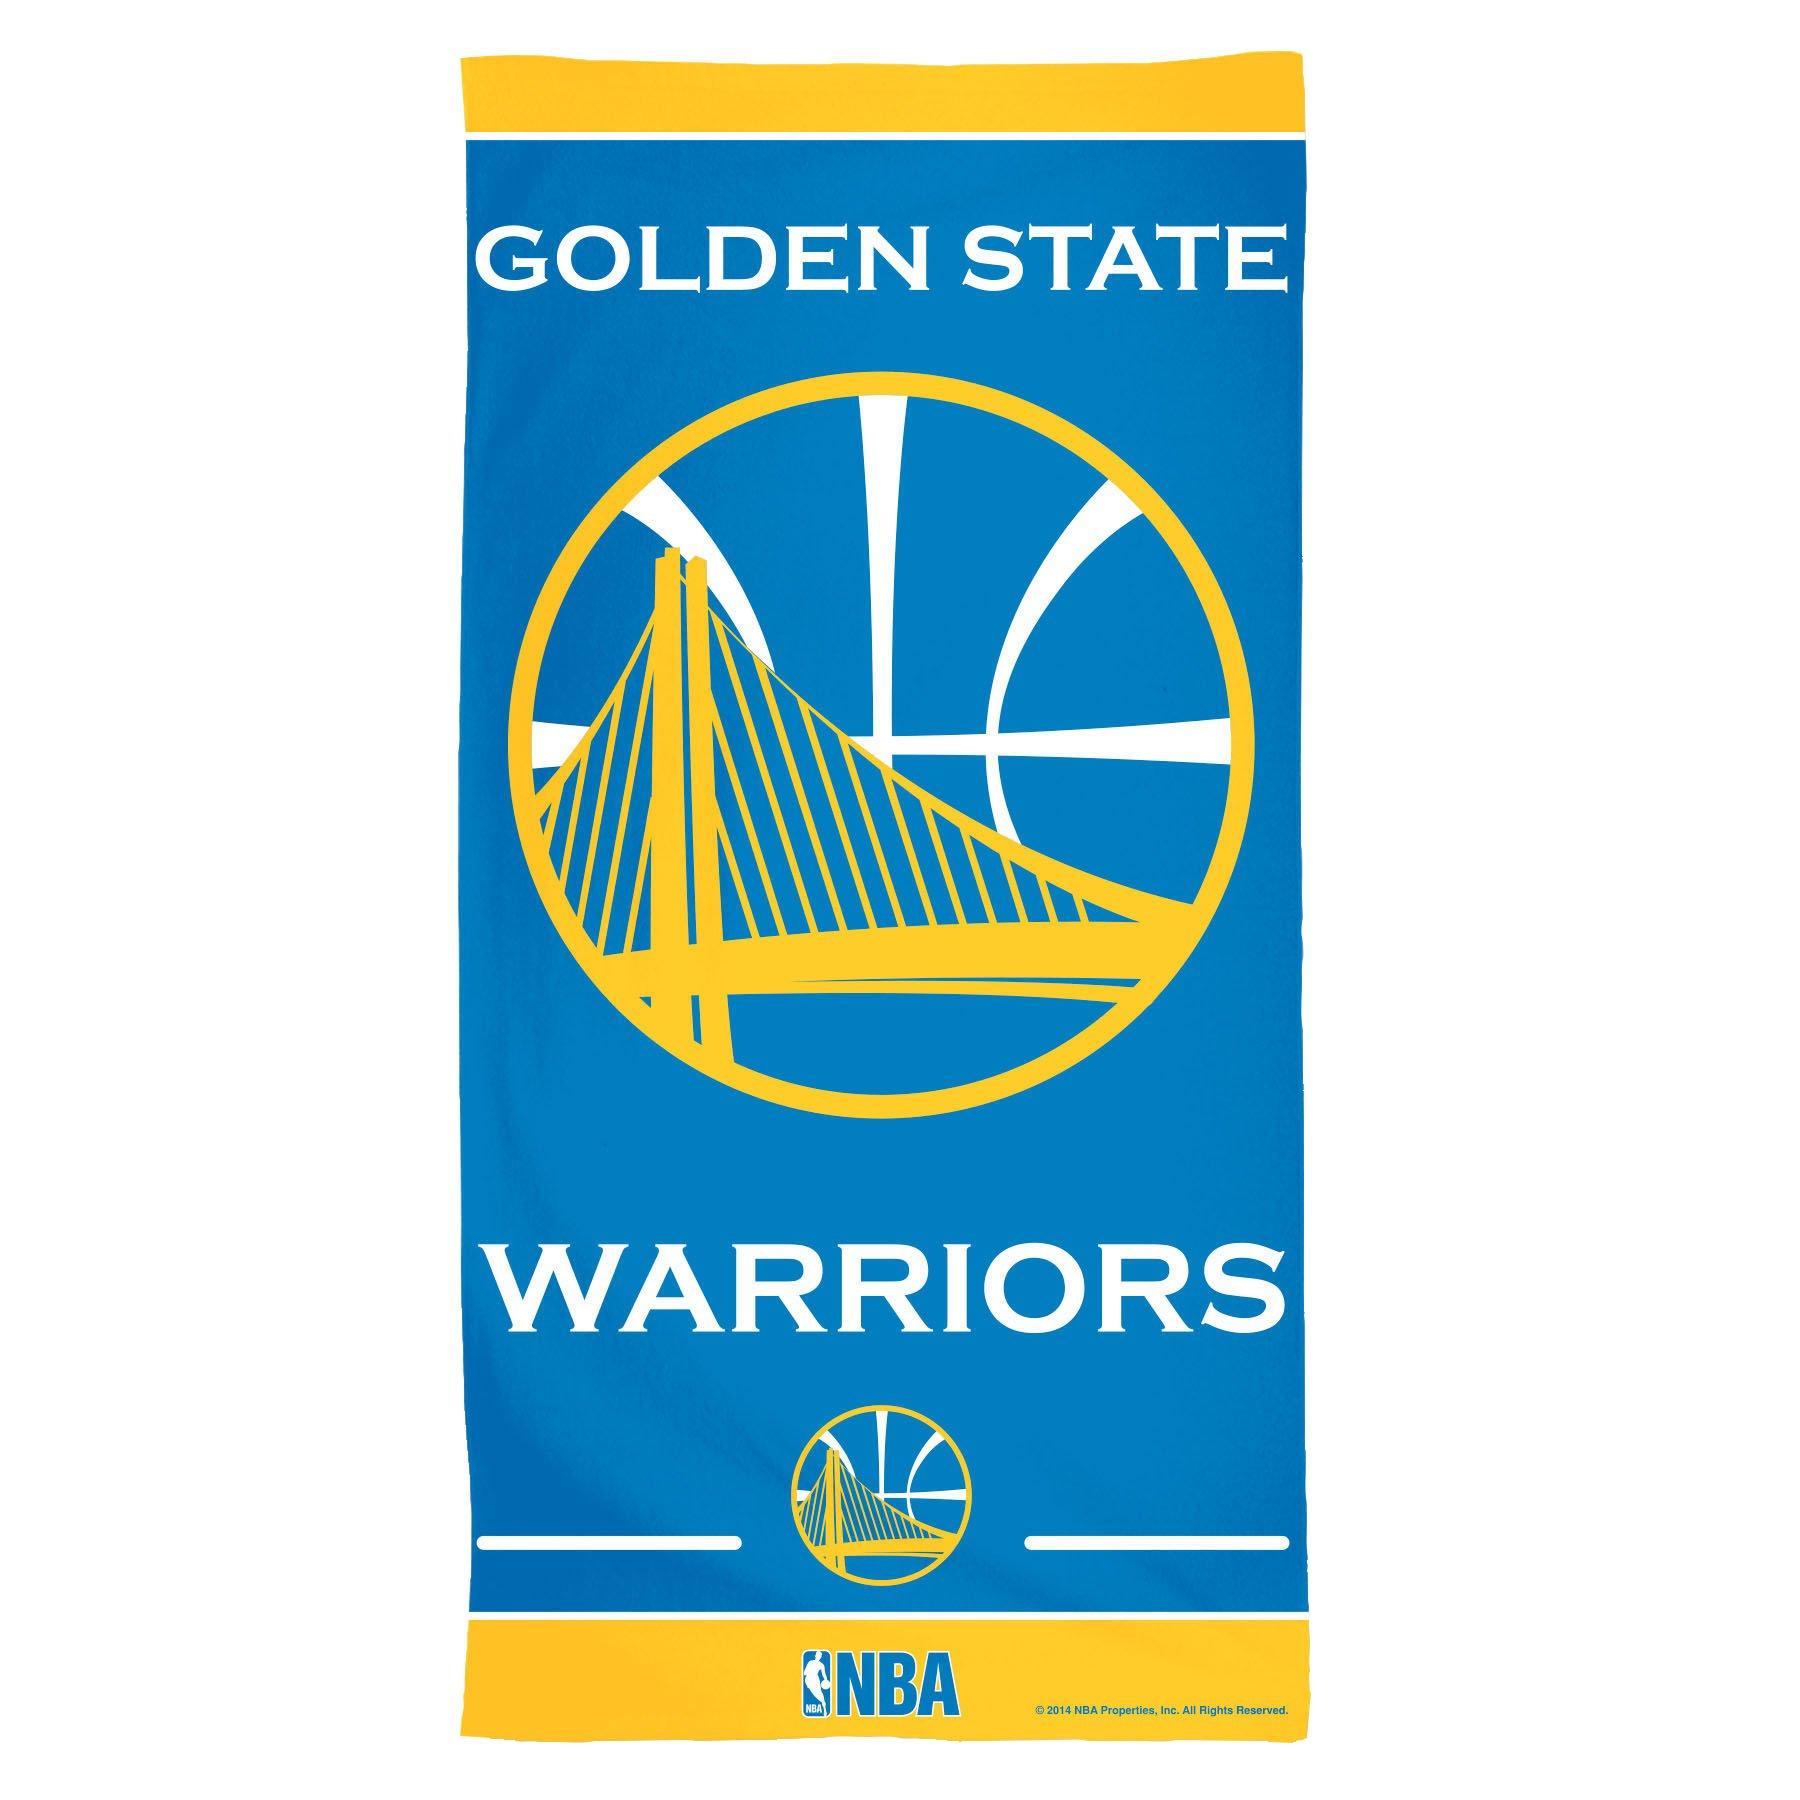 WINAV NBA Golden State Warriors Fiber Beach Towel, 30 x 60, Multicolor